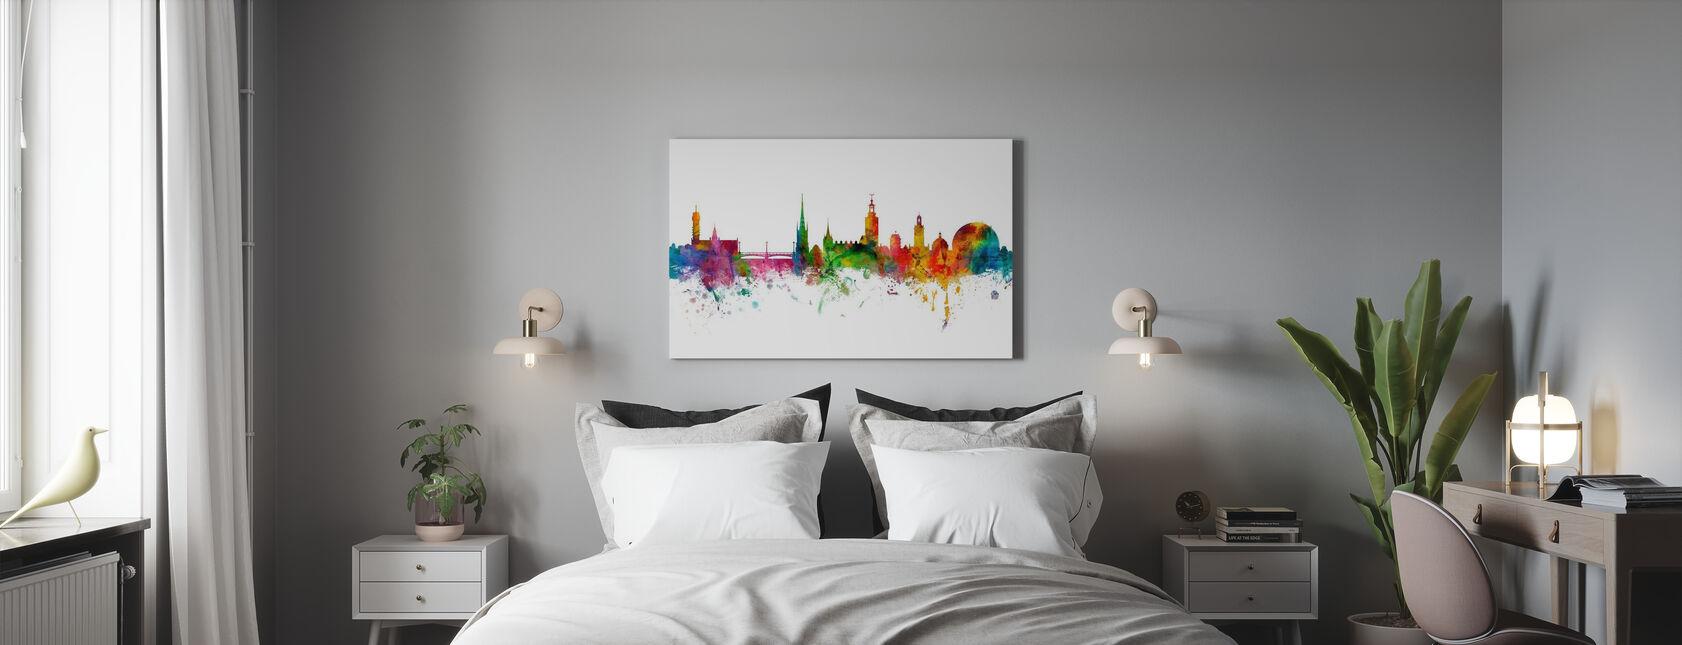 Tukholma - Canvastaulu - Makuuhuone